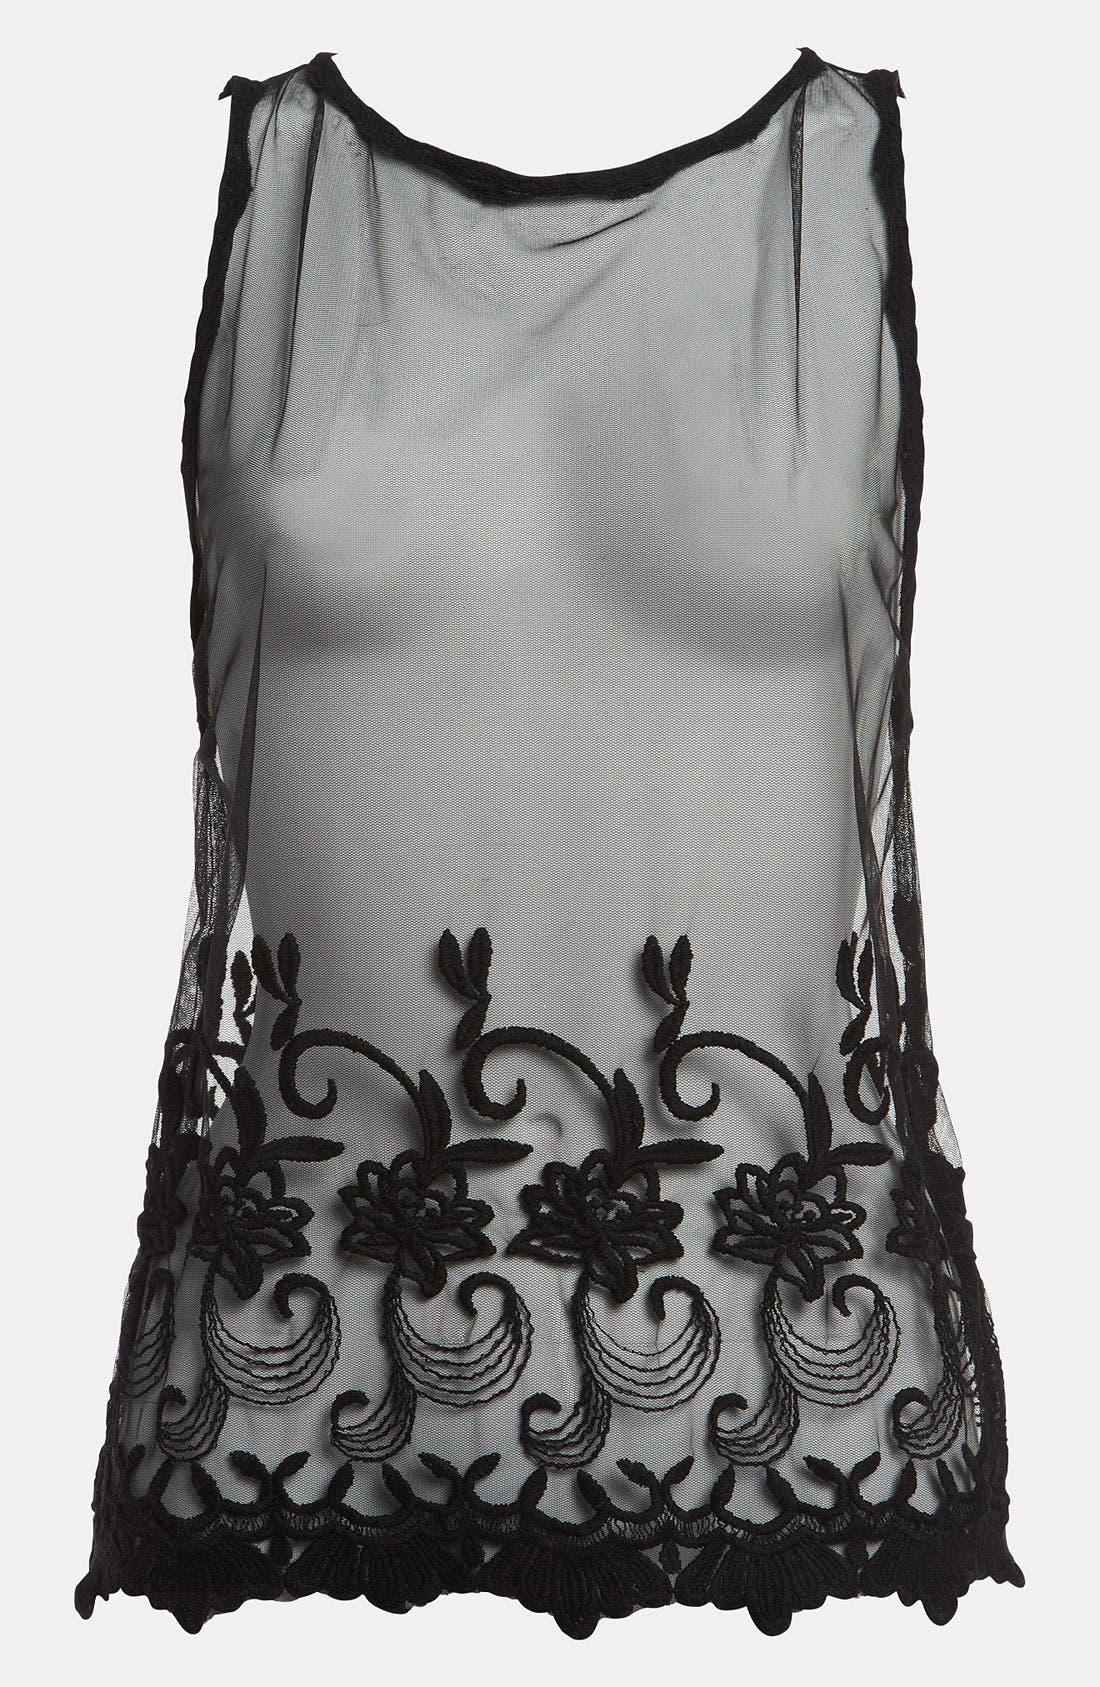 Alternate Image 1 Selected - Tildon Open Back Lace Top